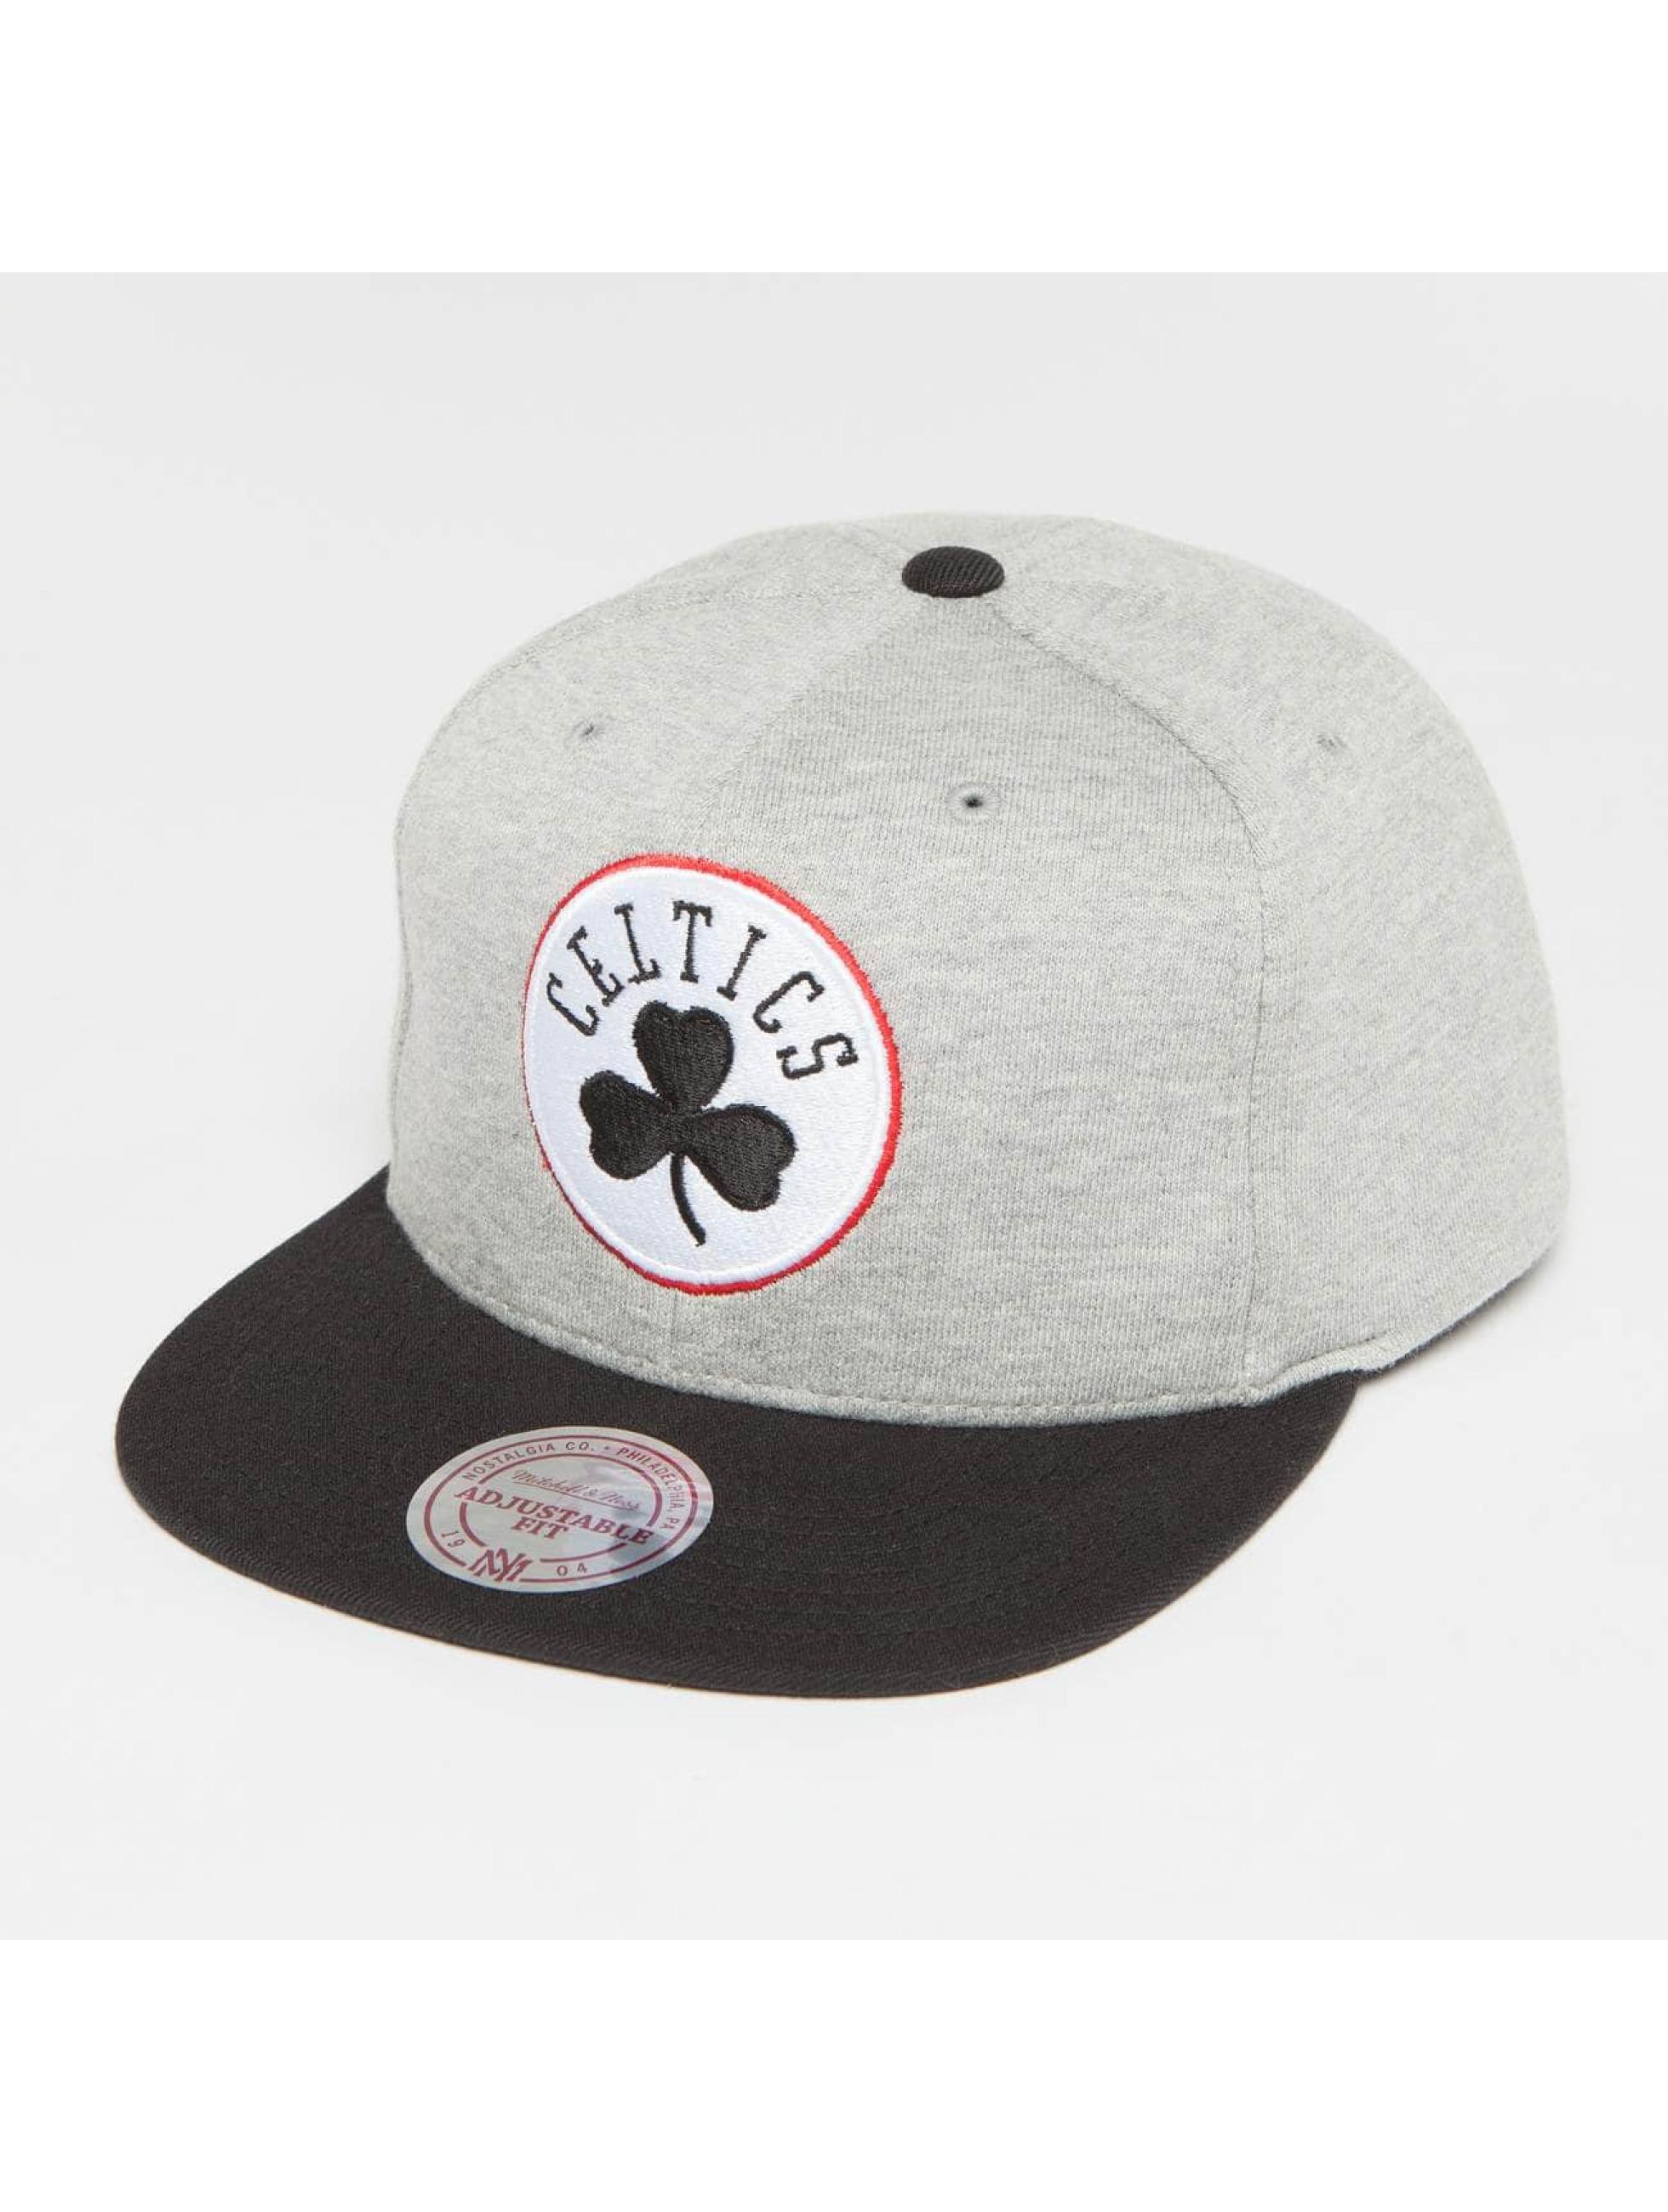 Mitchell & Ness Snapback Cap The 3-Tone NBA Bosten Celtics gray